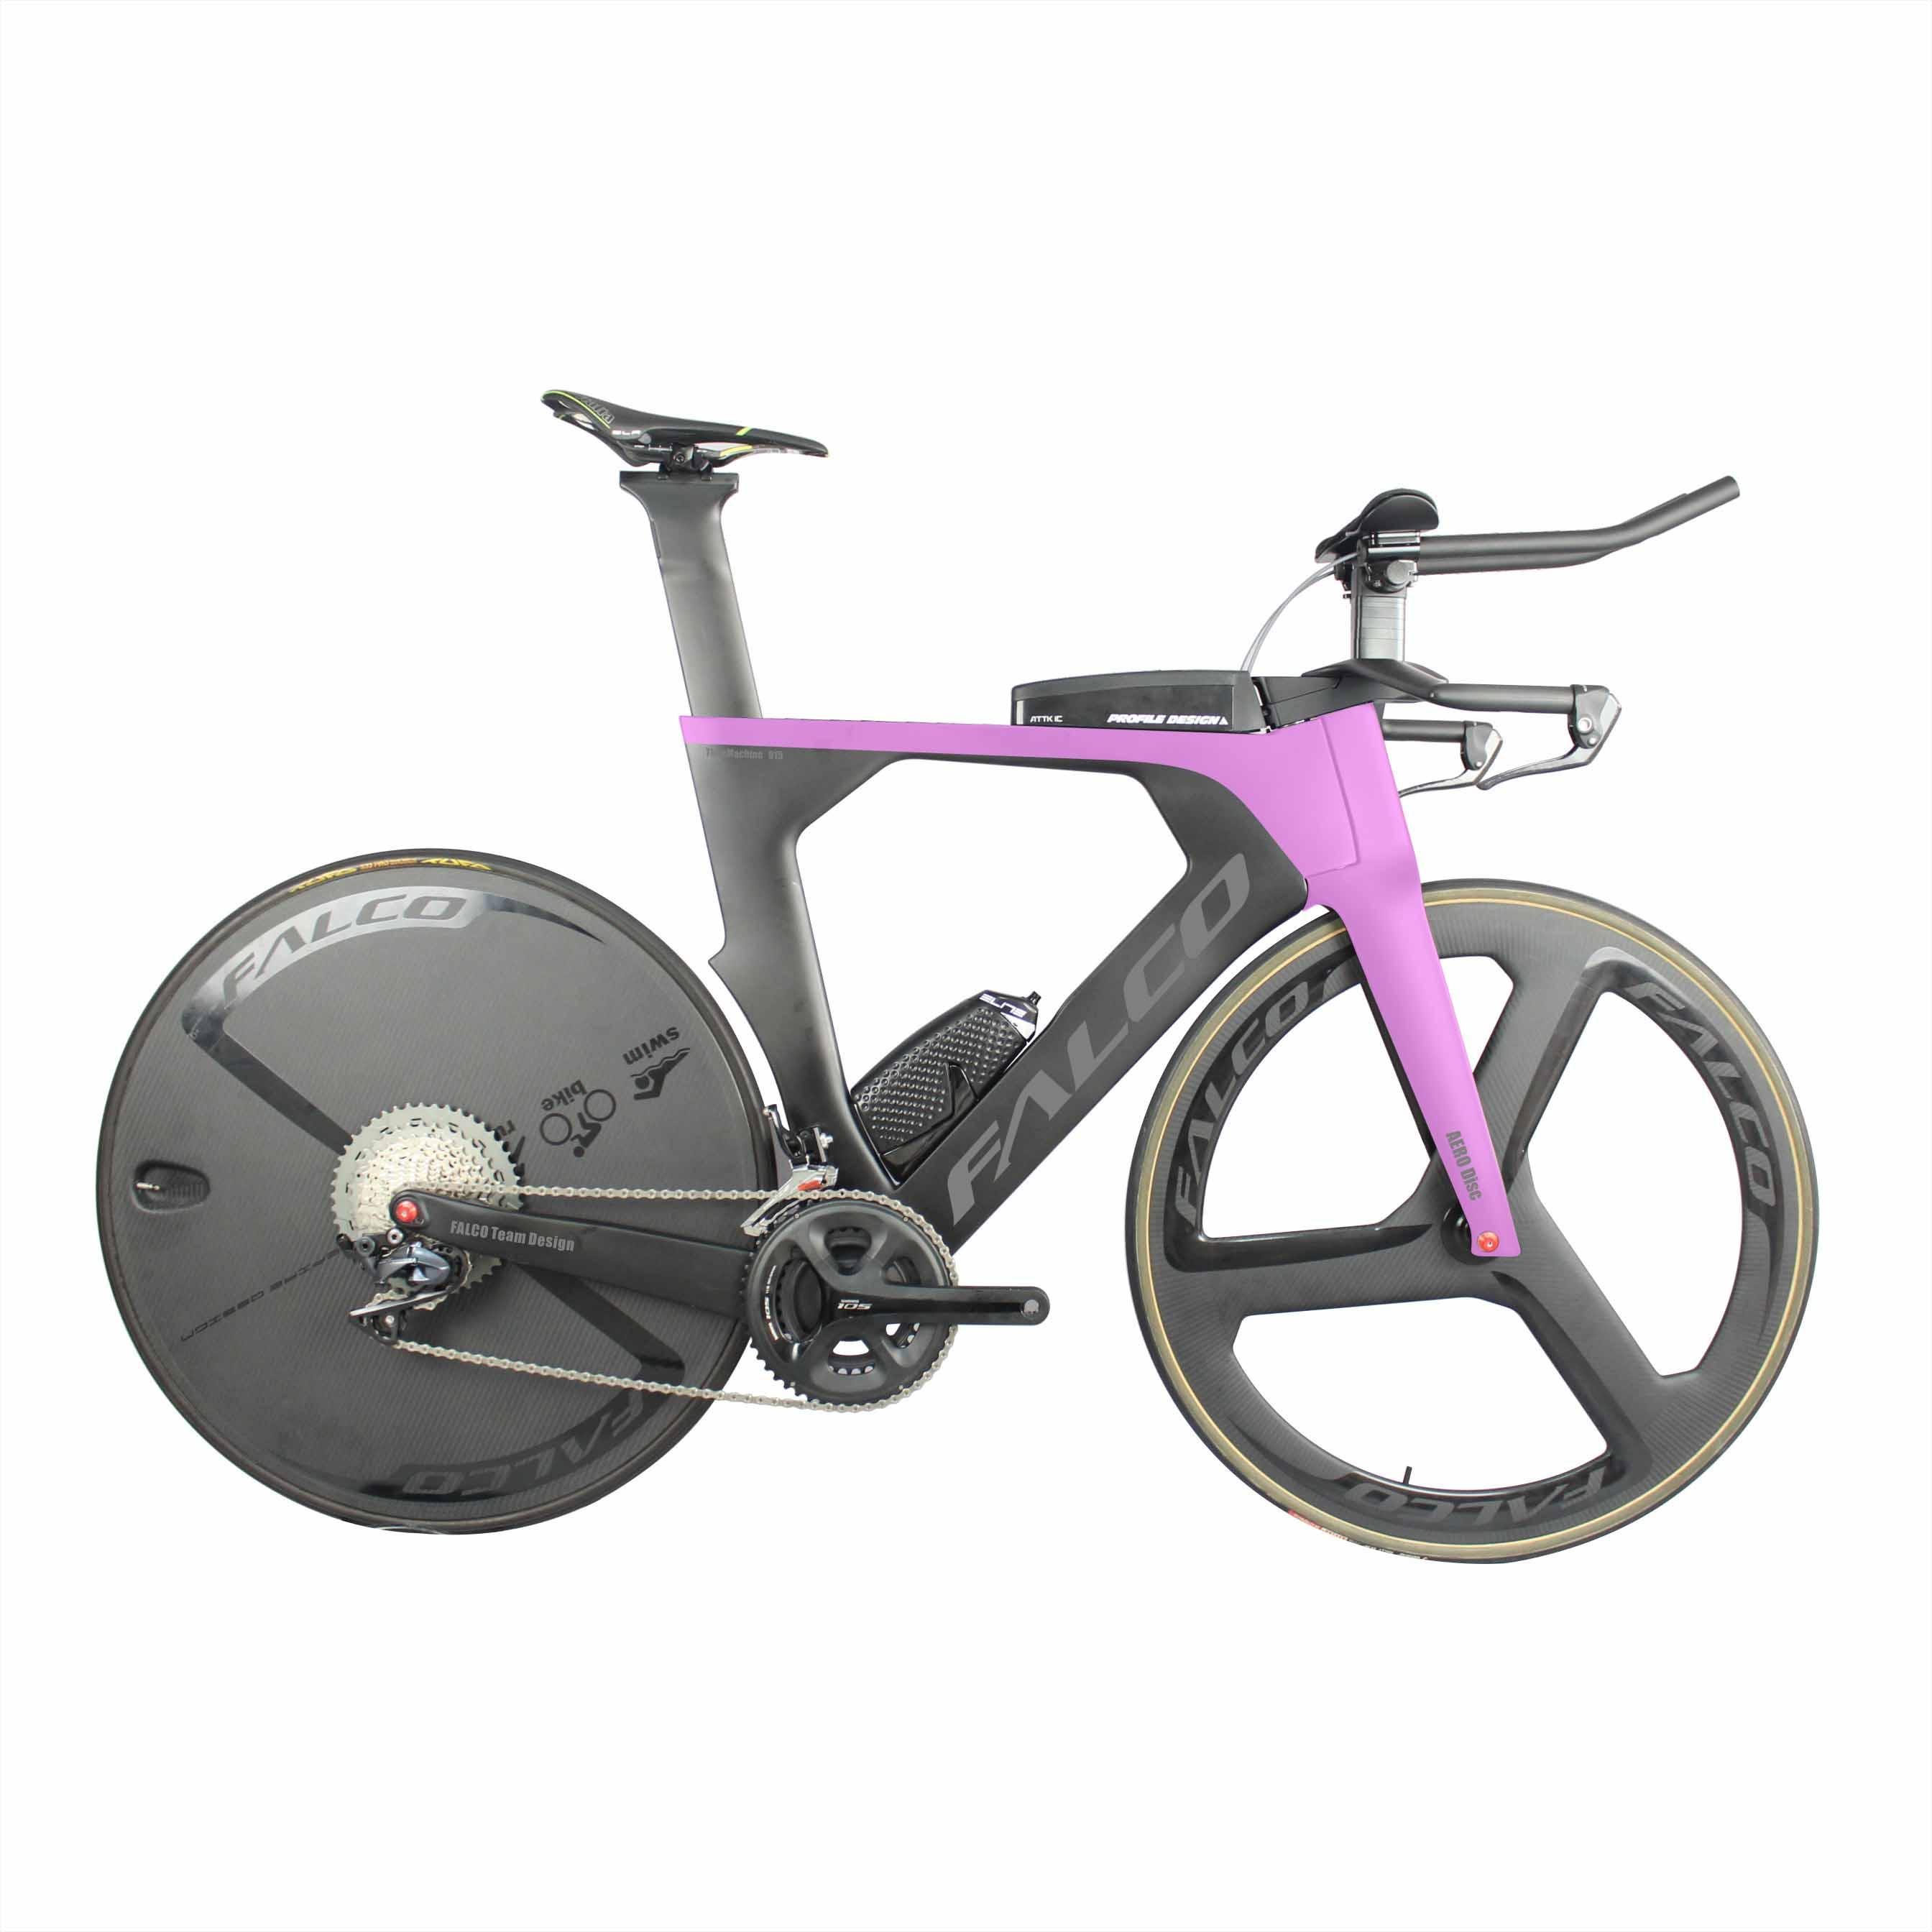 Winow Aero Time Trail Disc BRAKE TT Carbon font b bike b font carbon Road Complete